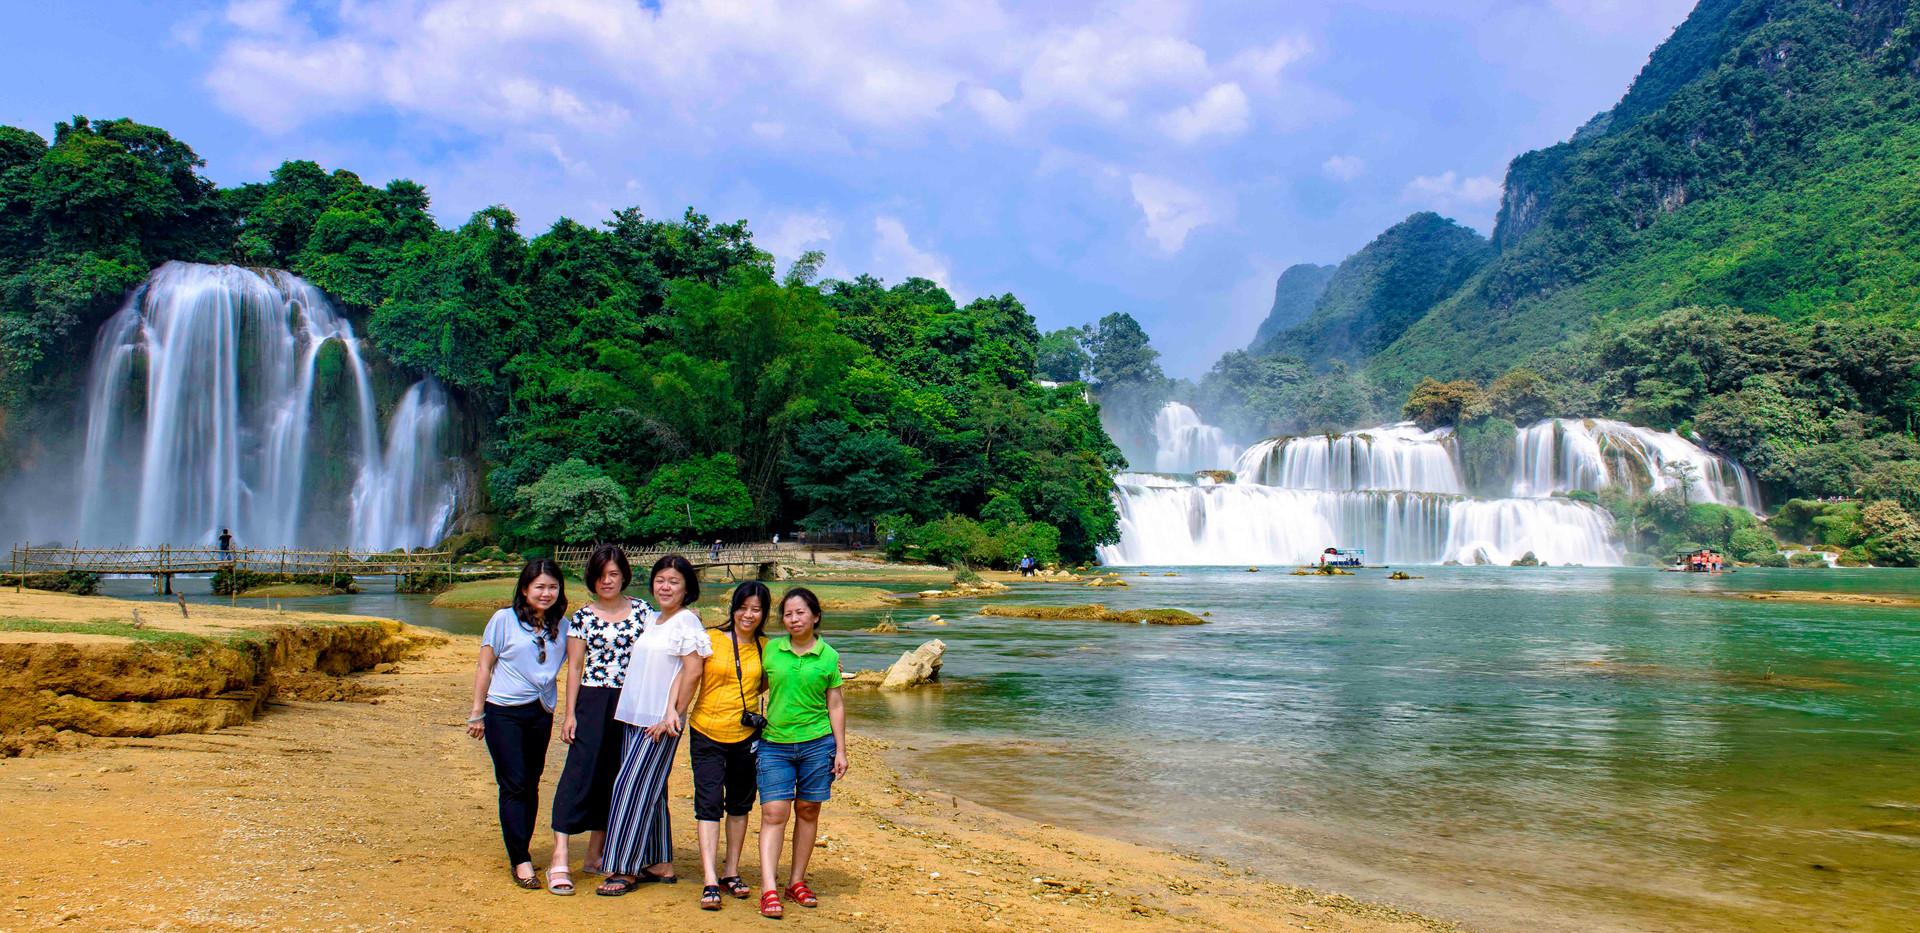 Ban Gioc waterfall photography tour from Hanoi